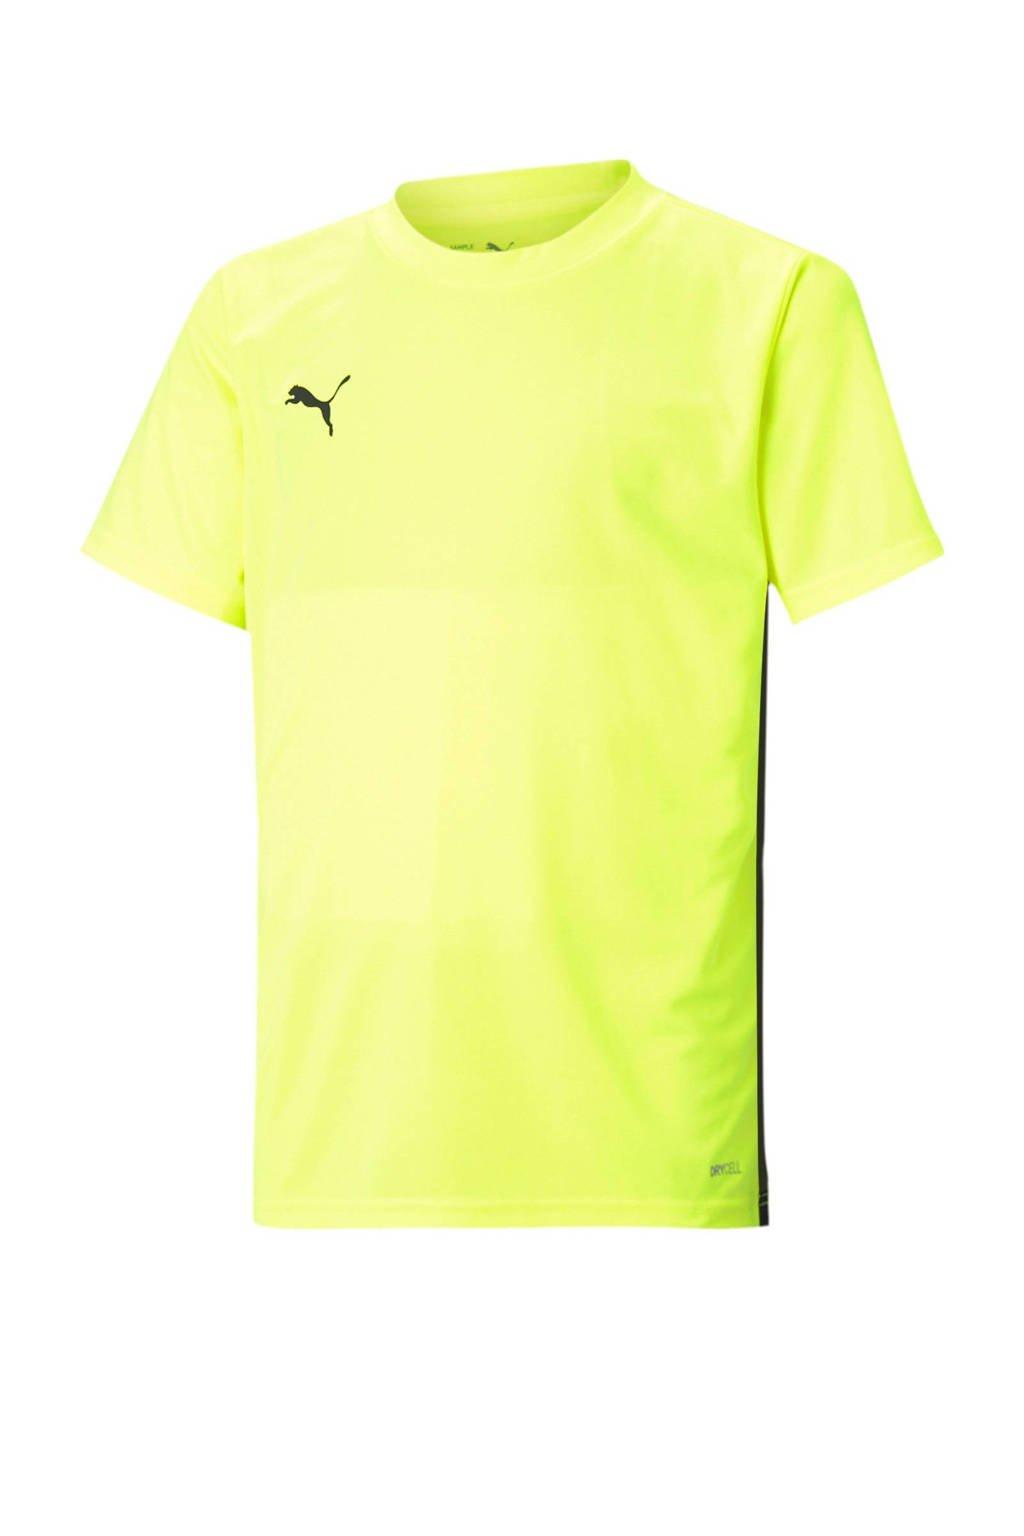 Puma Junior  voetbalshirt geel/zwart, Geel/zwart